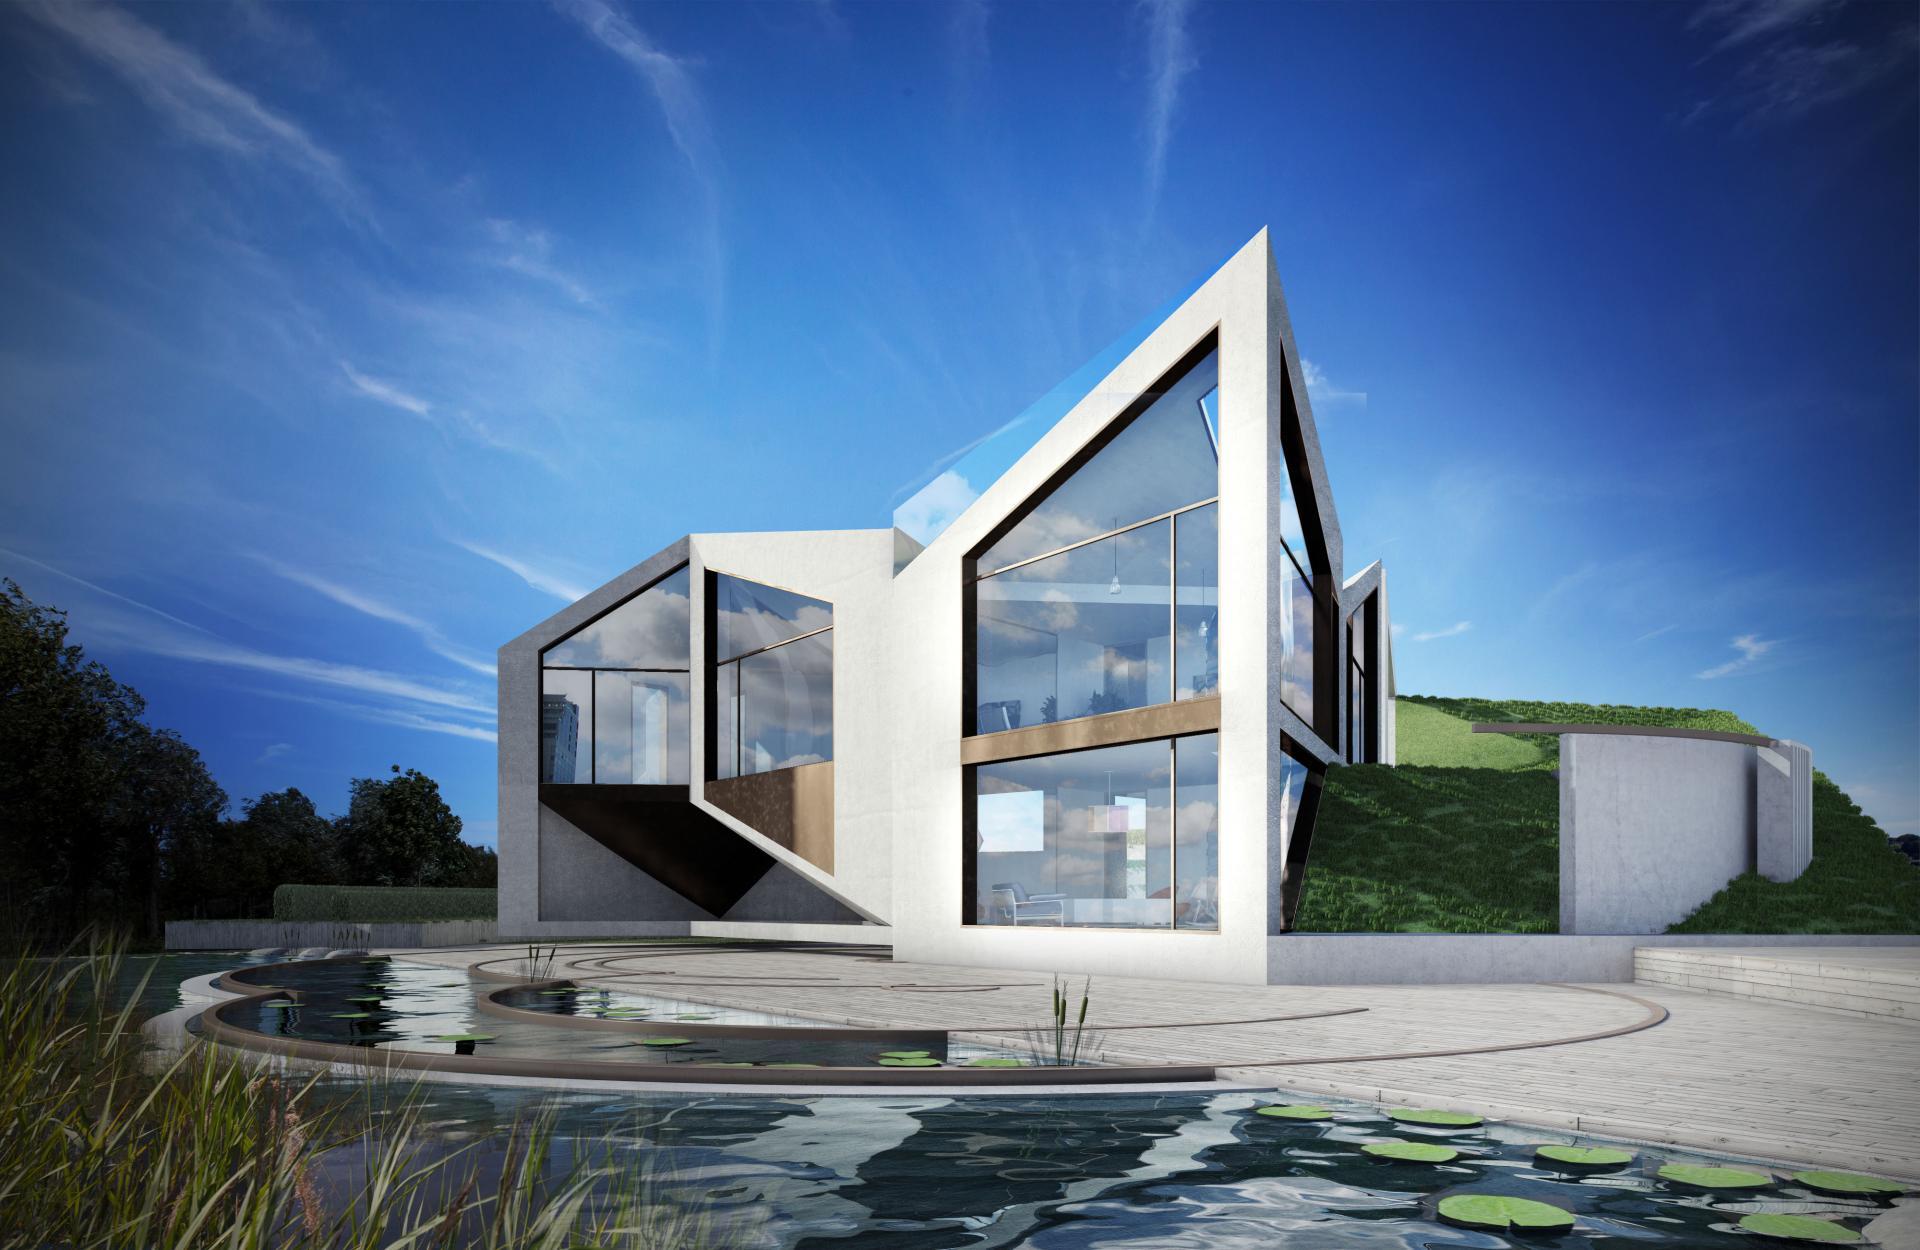 The d haus by david ben gr nberg daniel woolfson - Make your house a home ...